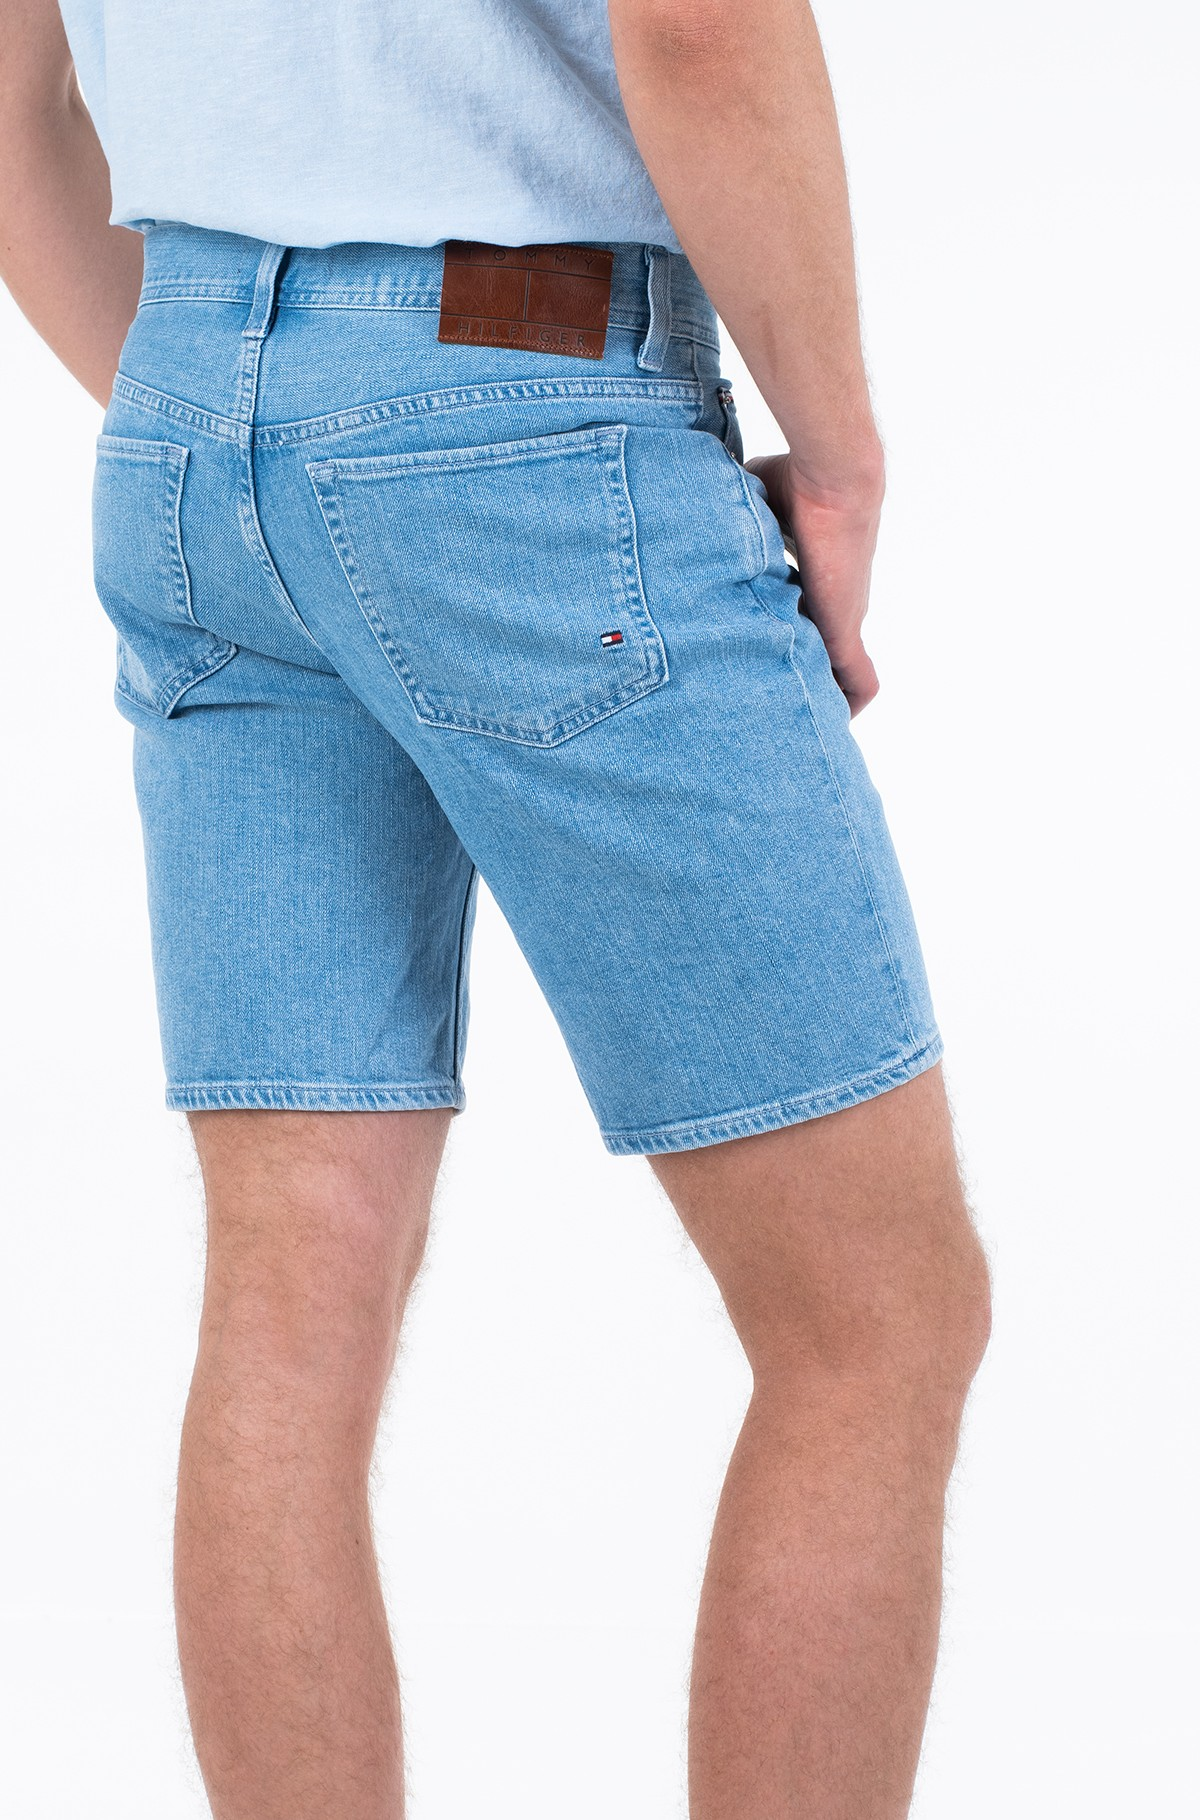 Shorts BROOKLYN 5PKT SHORT ALTON BLUE-full-2